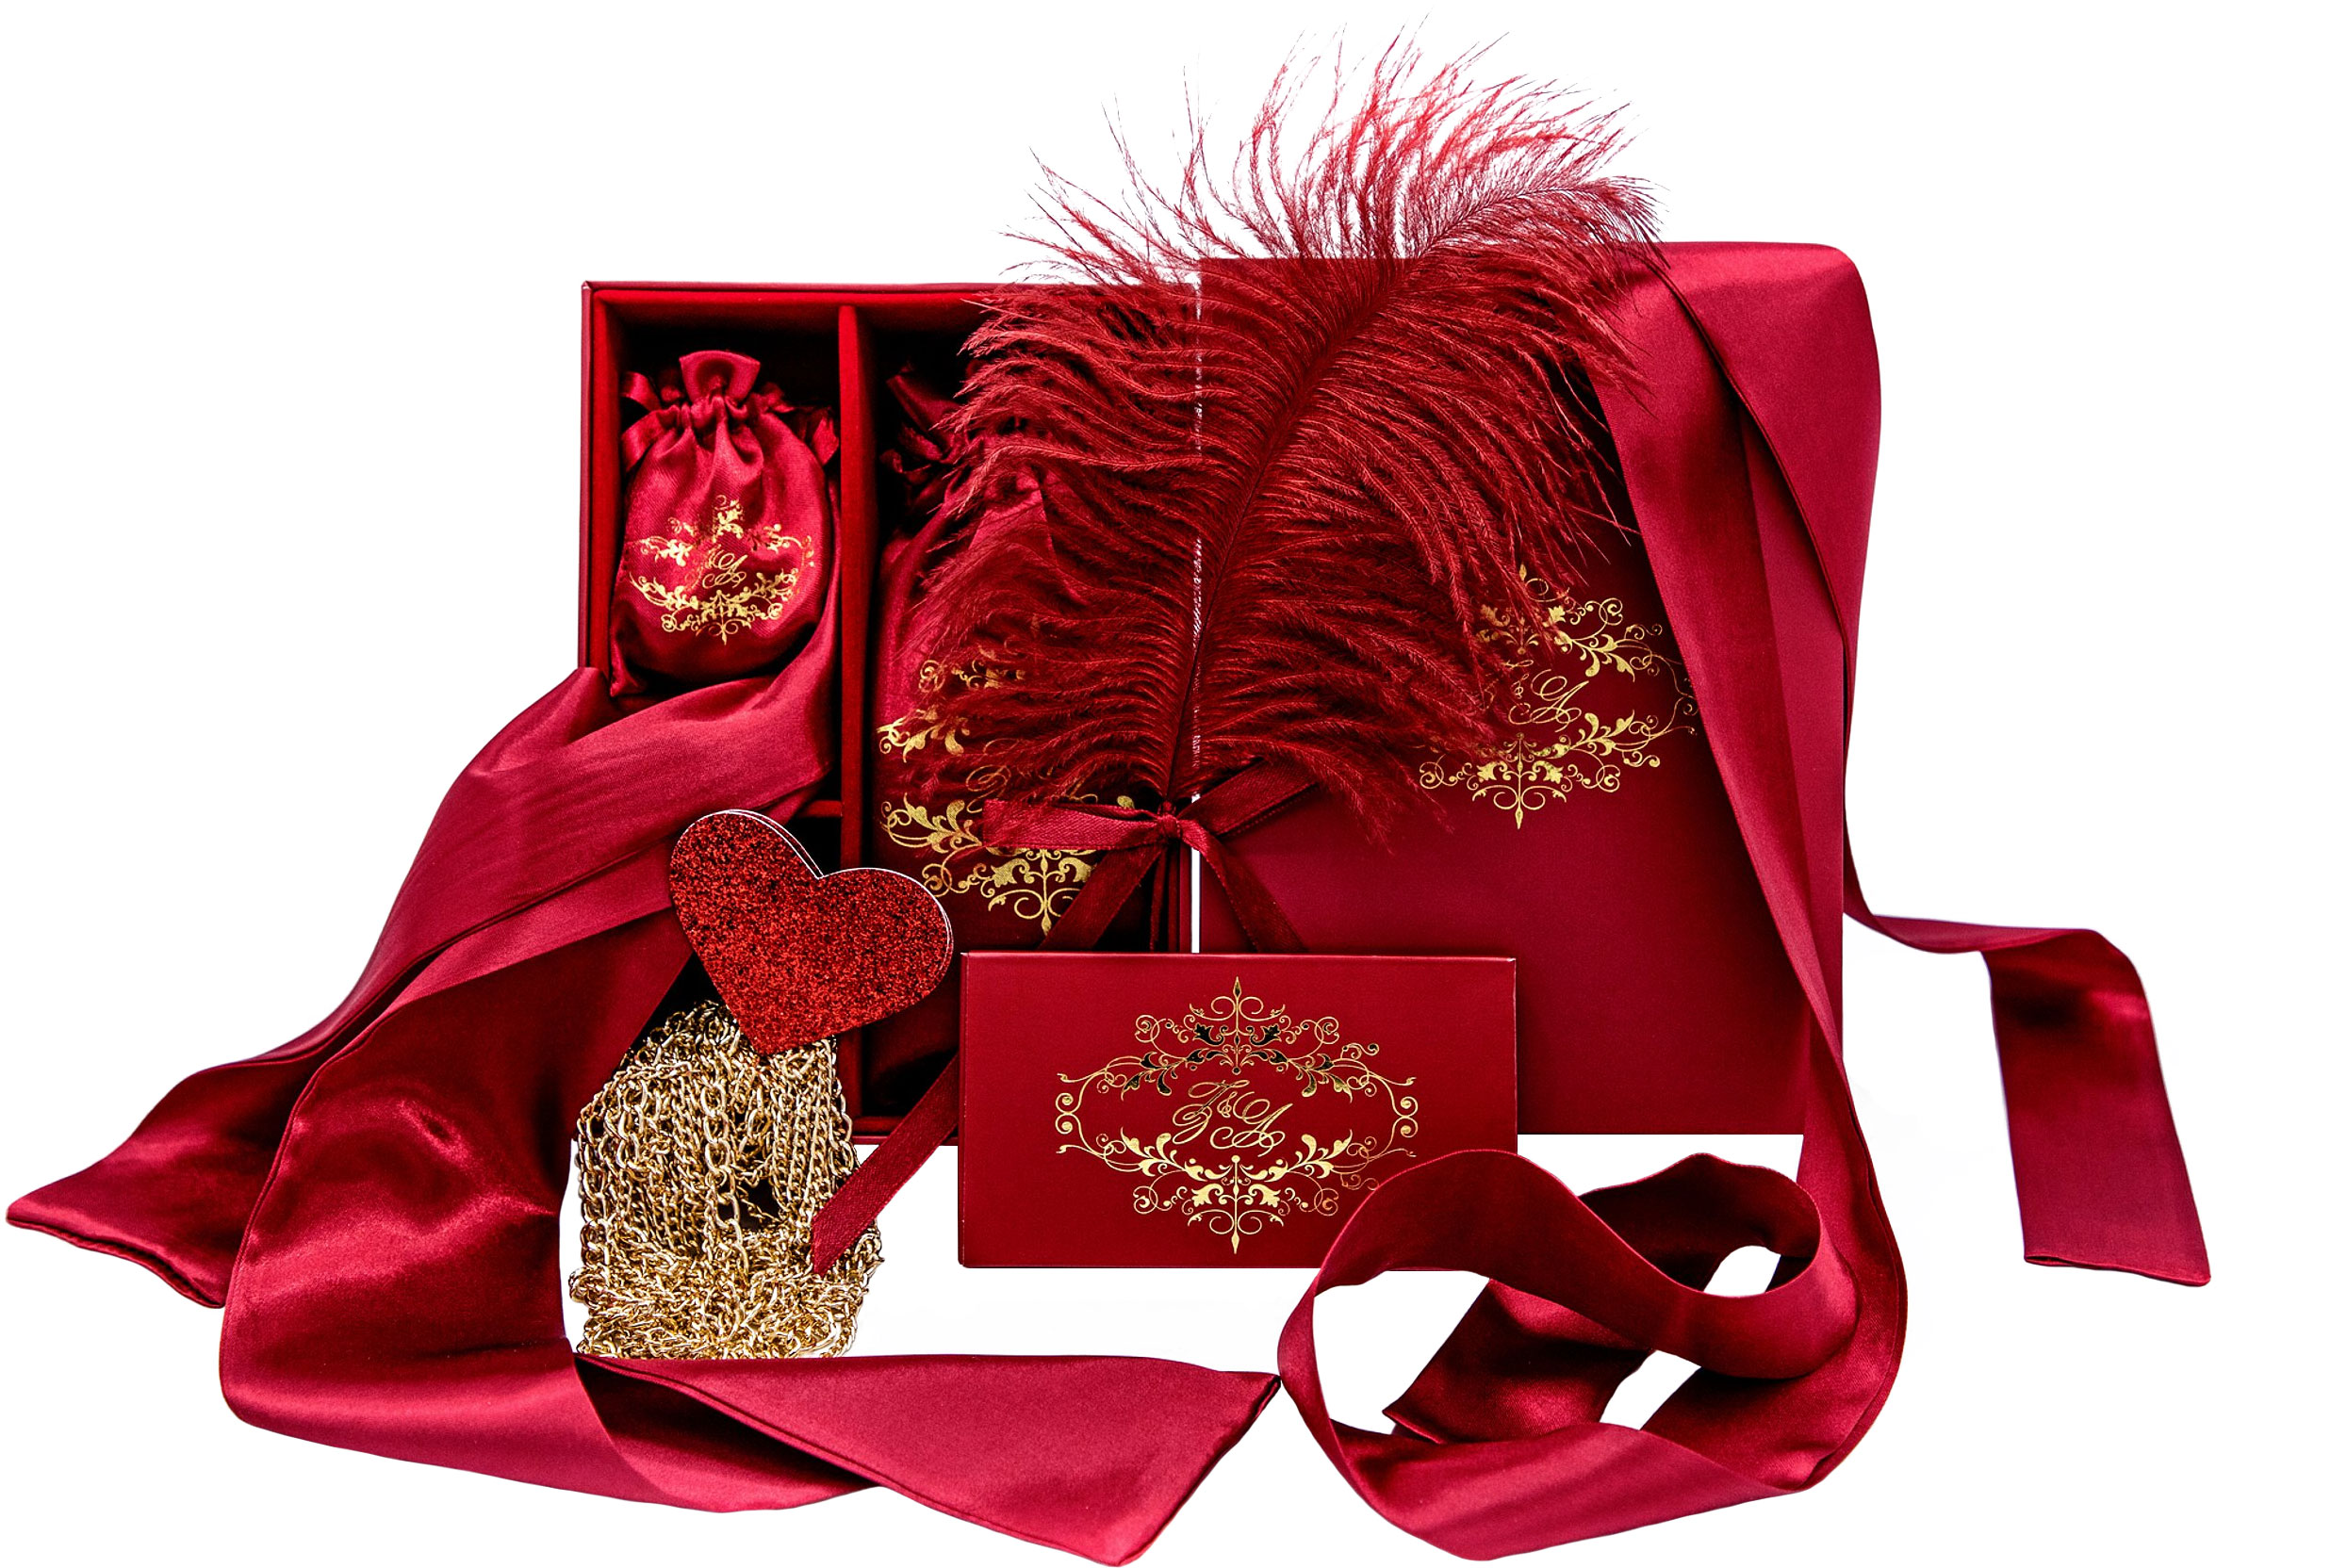 Zoe & Alexandra Passionate Priestess Romantic Accessory Boudoir Box